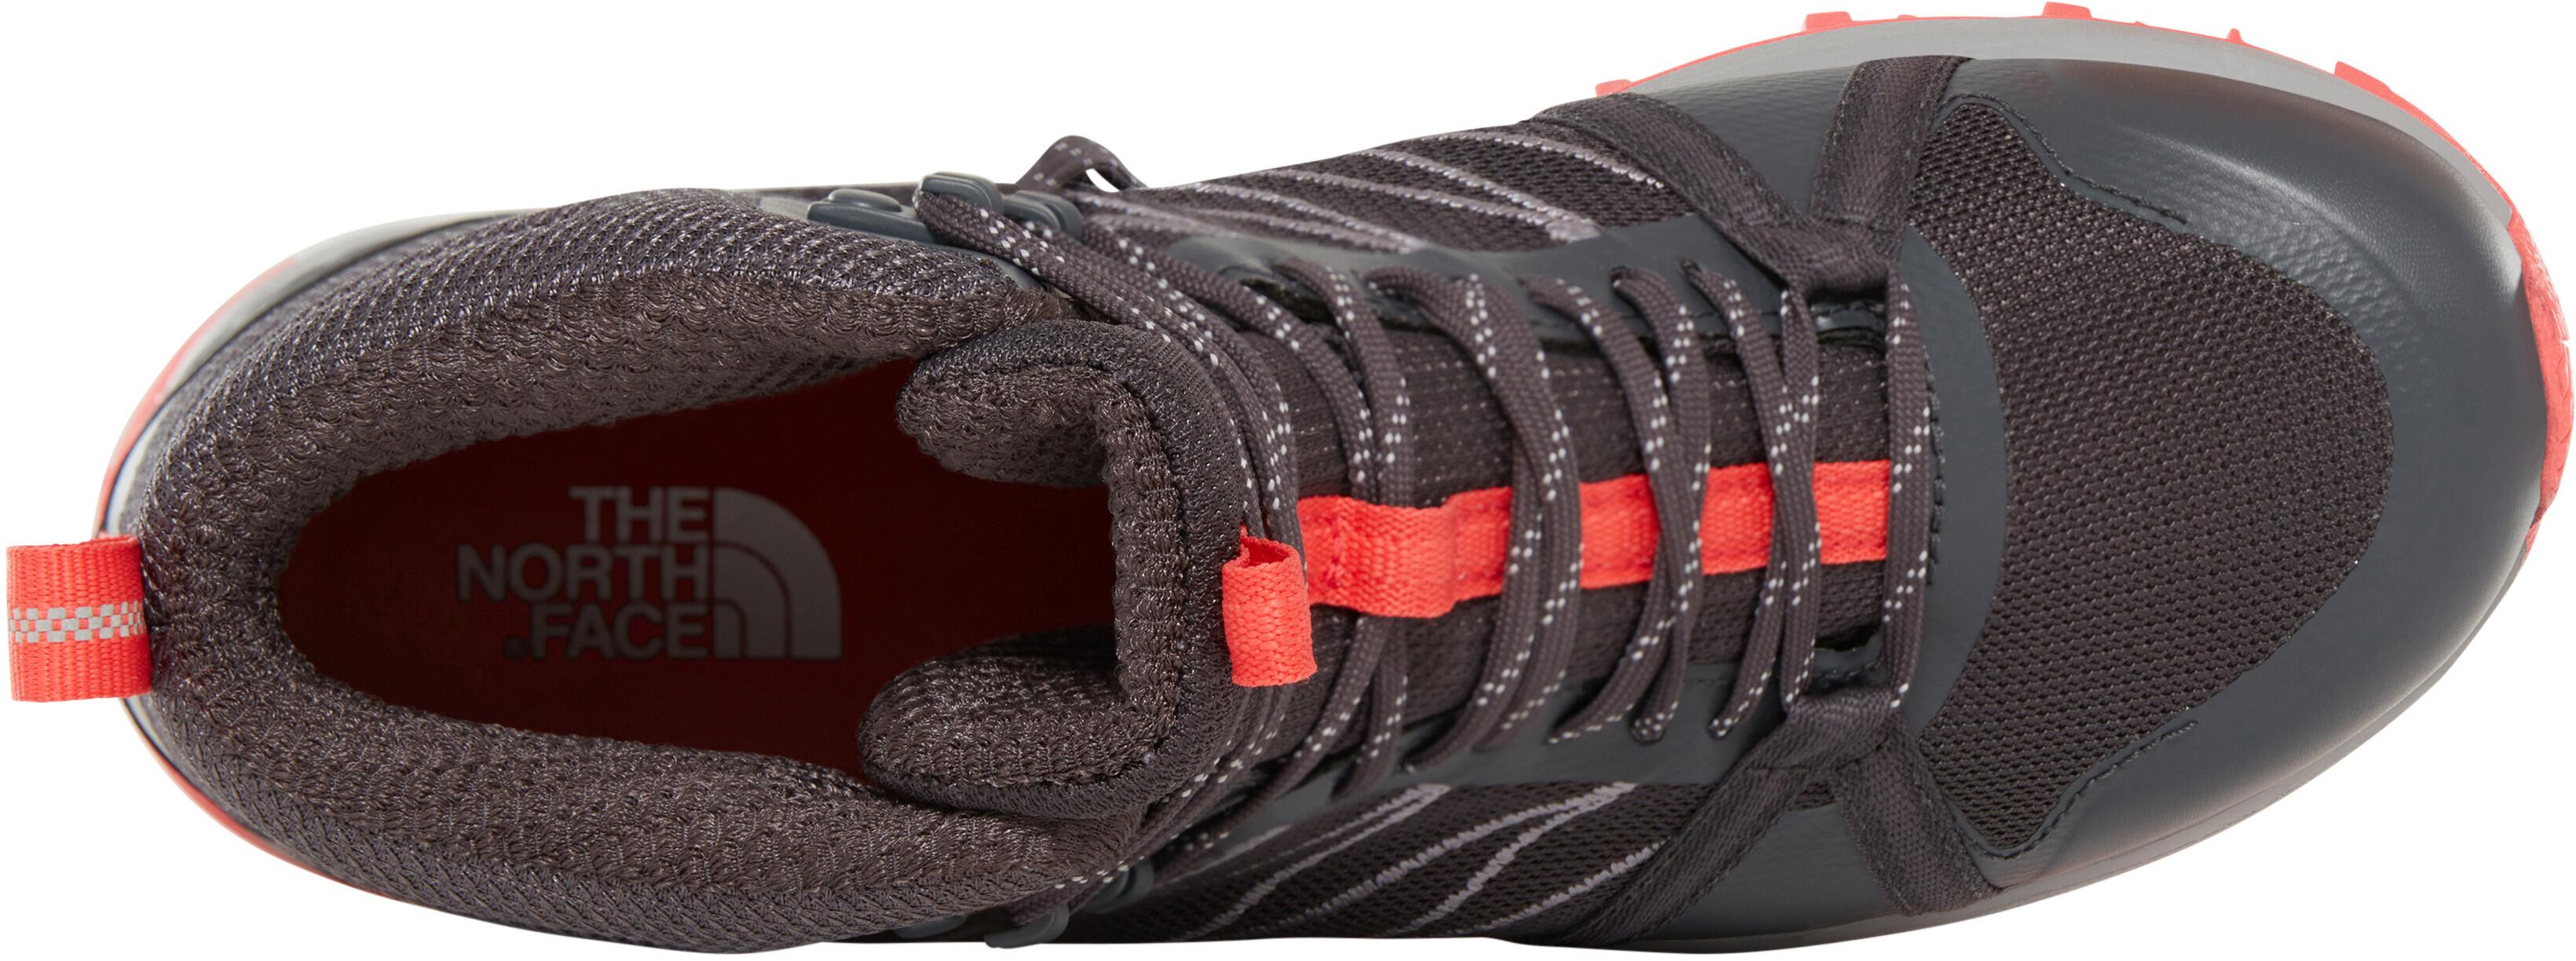 meet 5b161 82070 The North Face Litewave Fastpack II Mid GTX Shoes Women ebony grey/fiesta  red